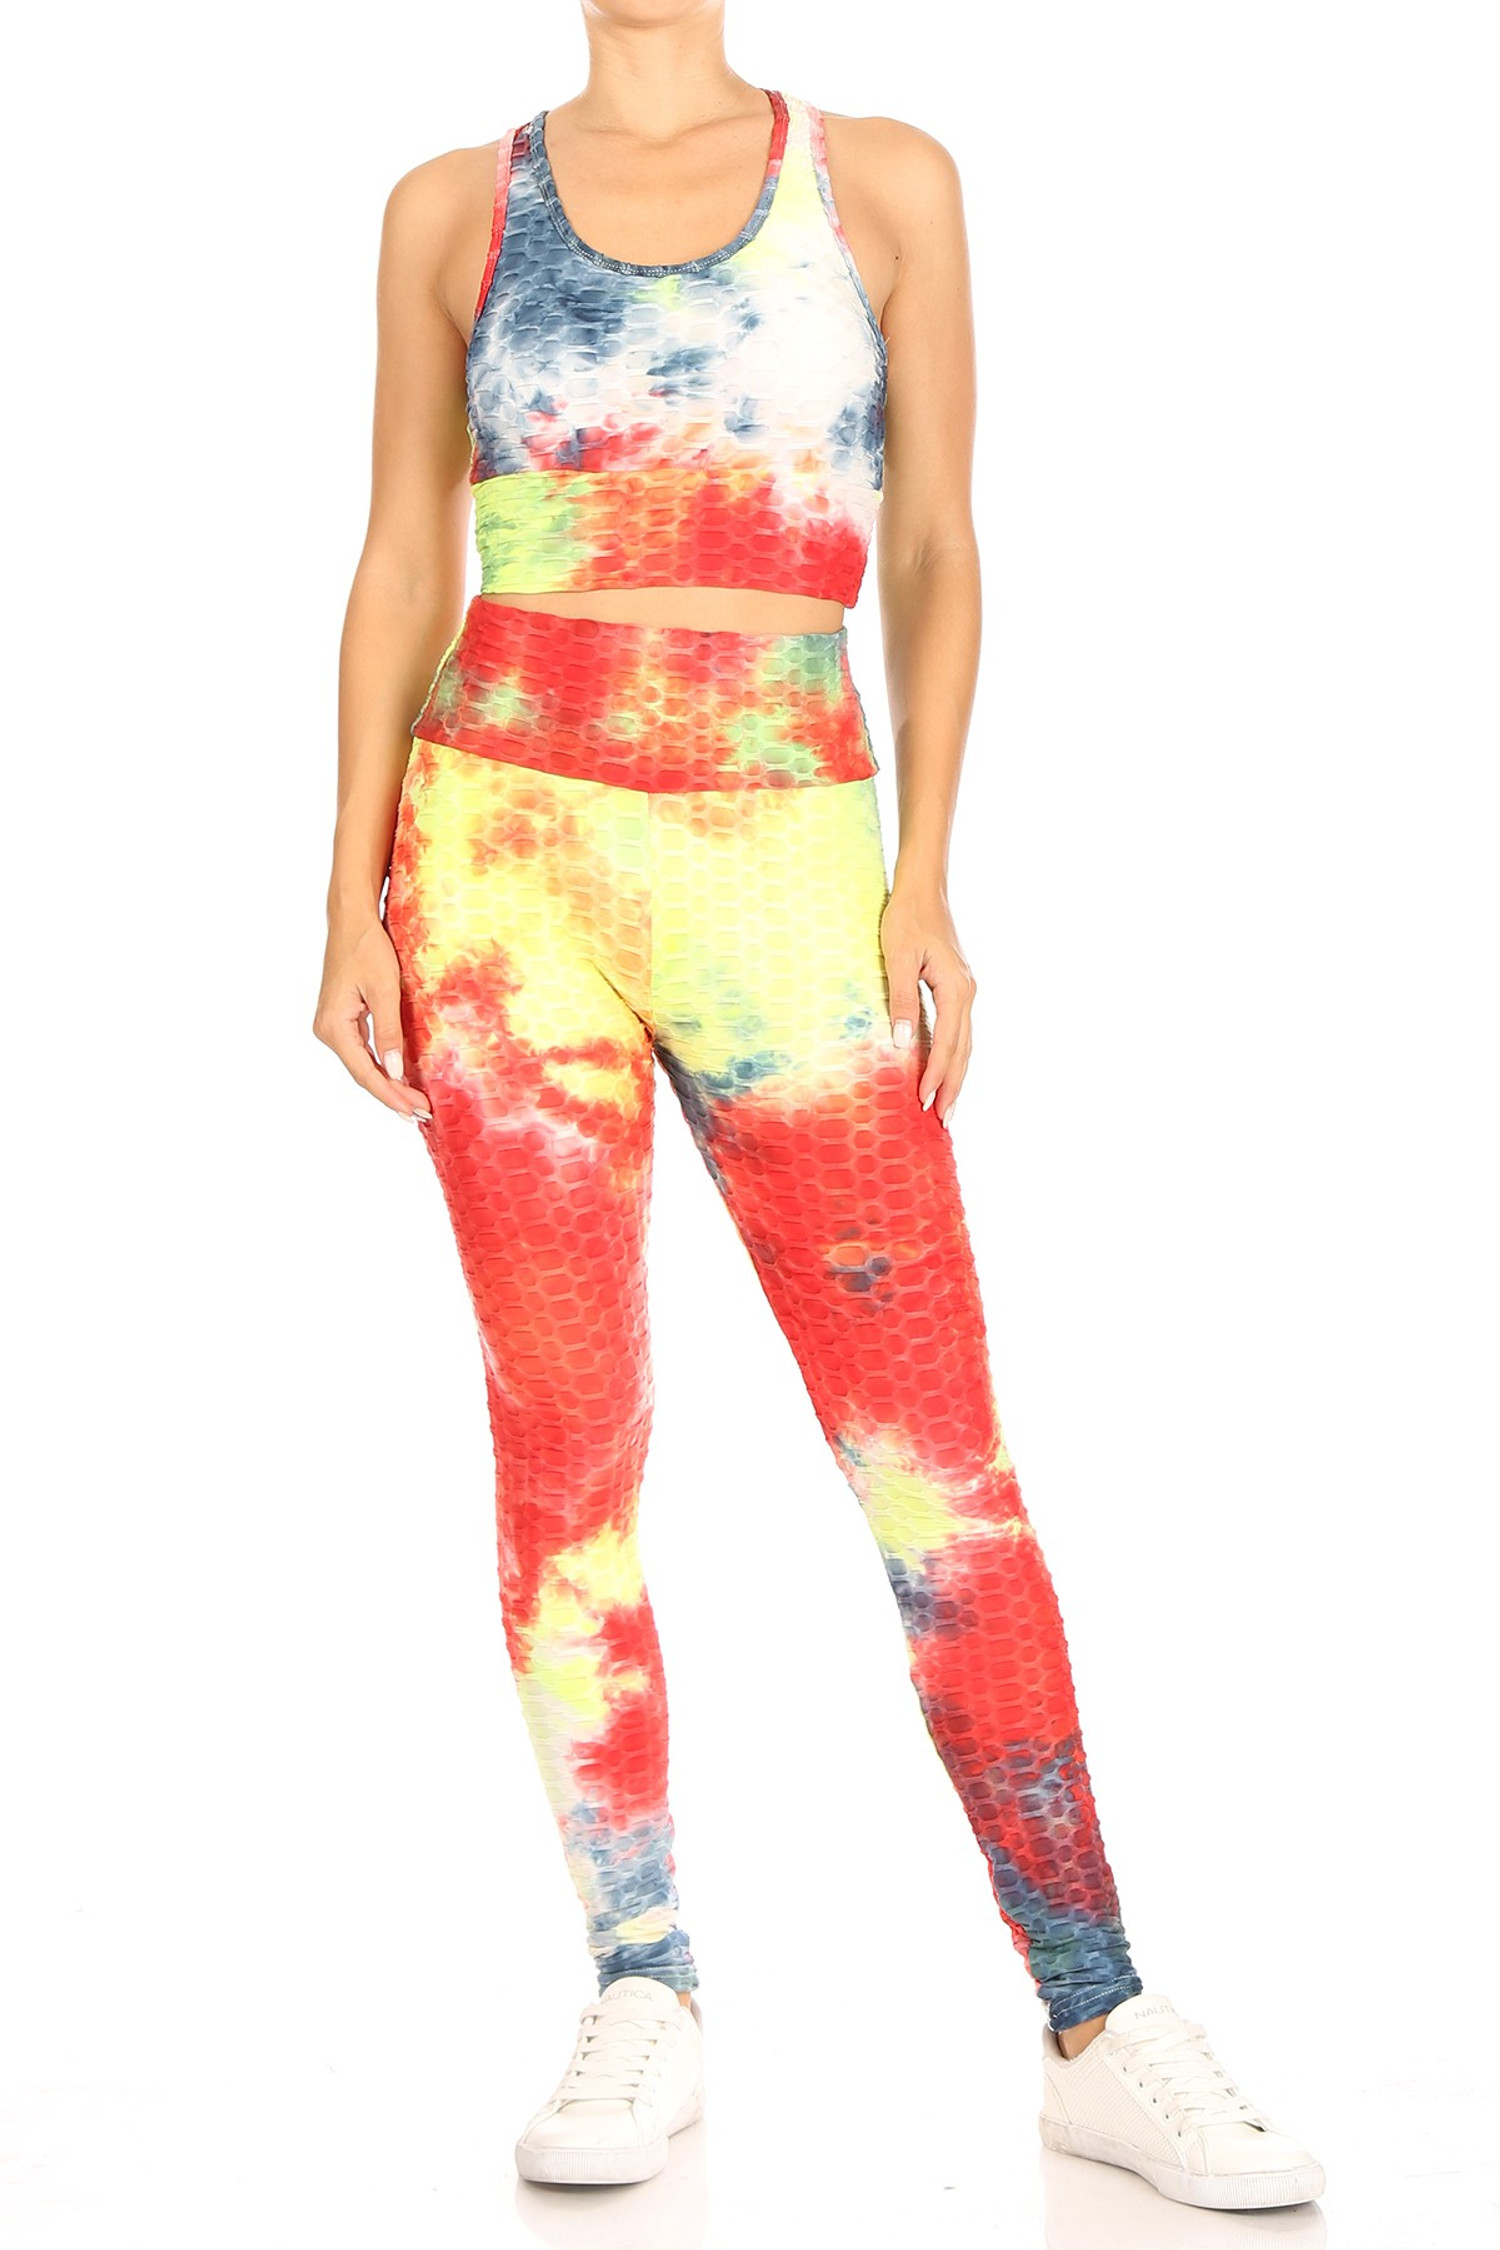 Multi-Color Tie Dye Scrunch Butt Top and Leggings Set